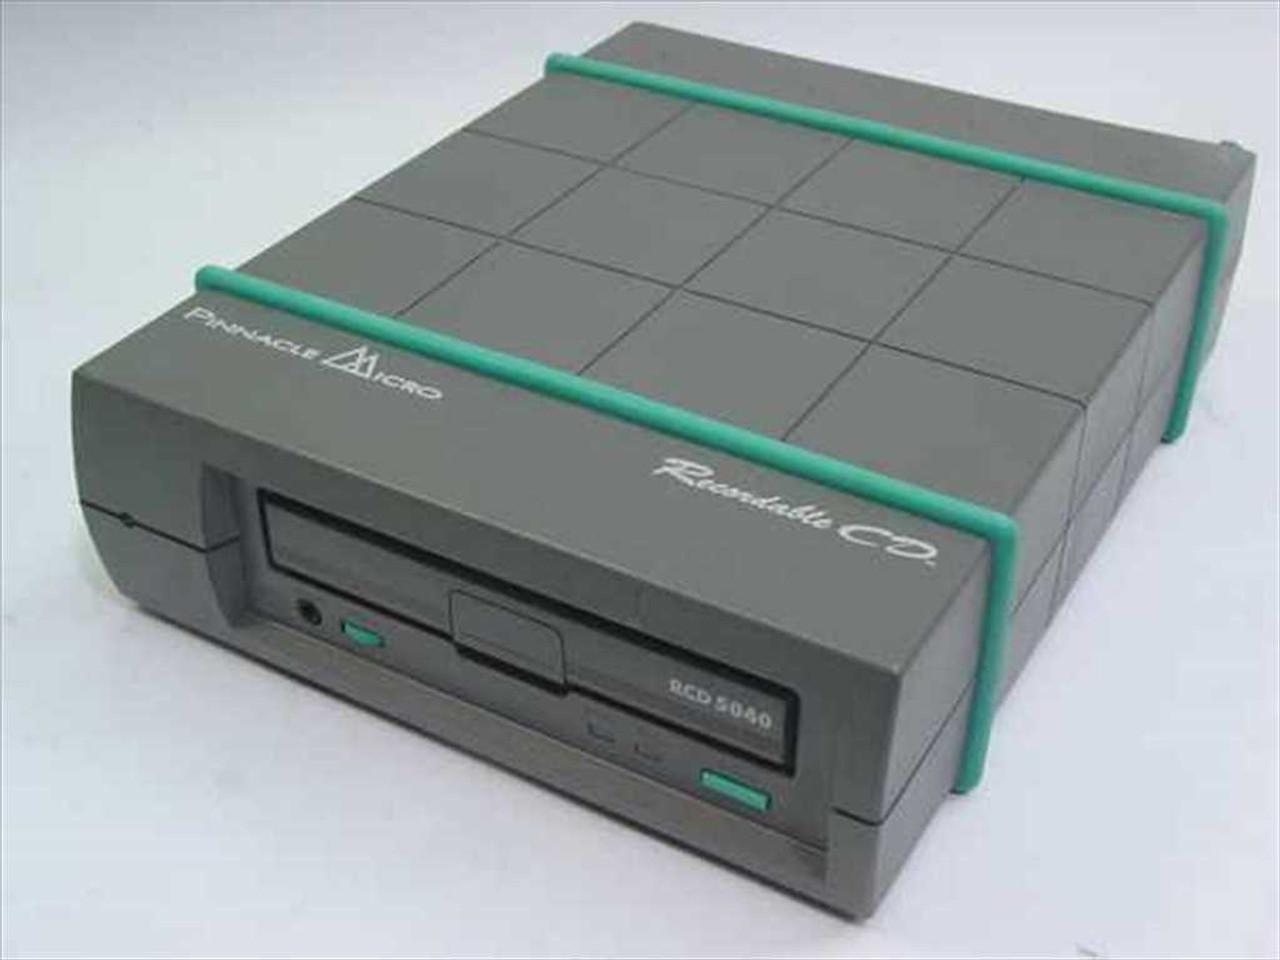 Pinnacle Micro RCD 5040 External Recordable CD rom Drive SCSI-1